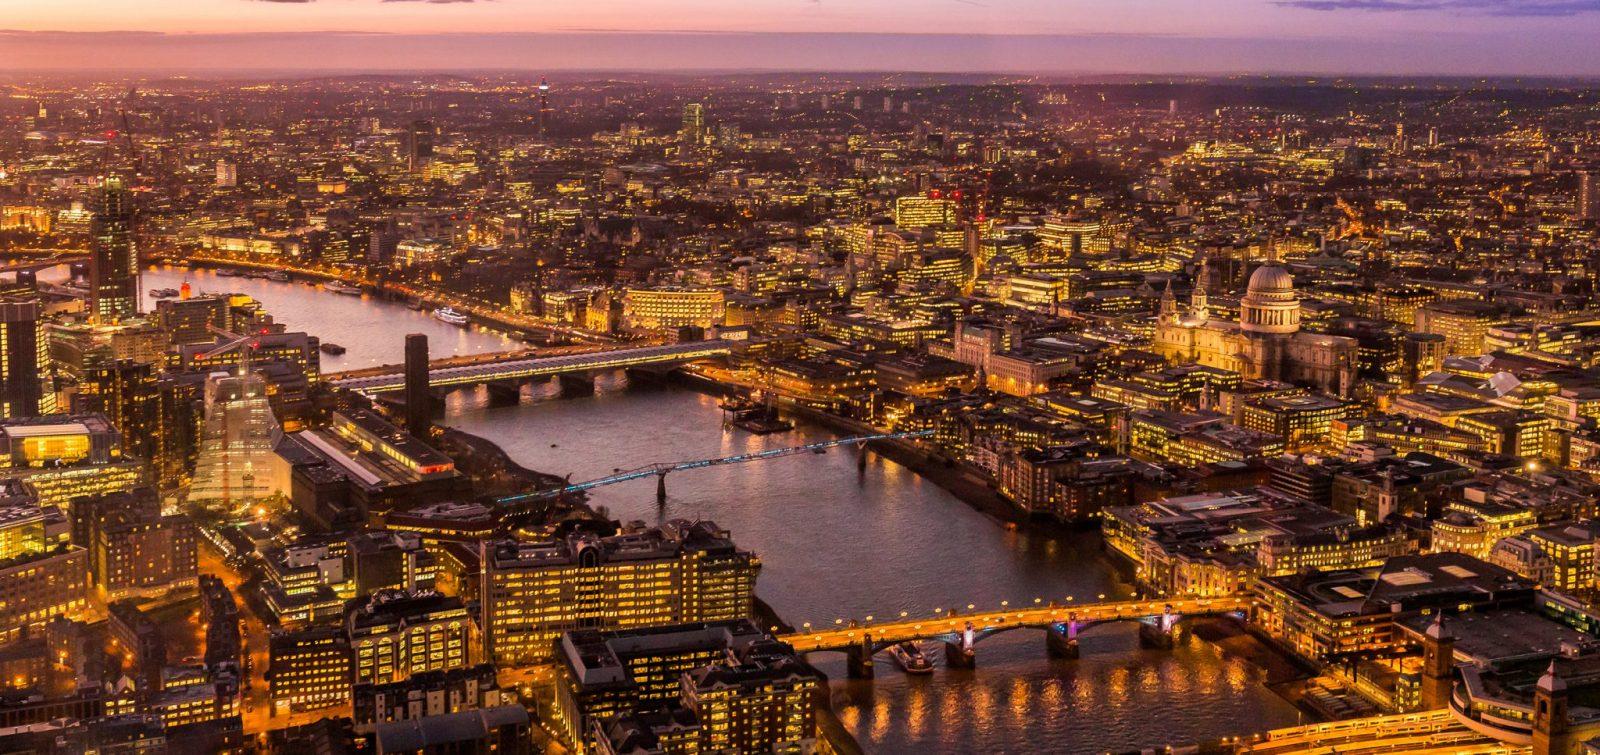 The 2017 Digital Salary Benchmark for London